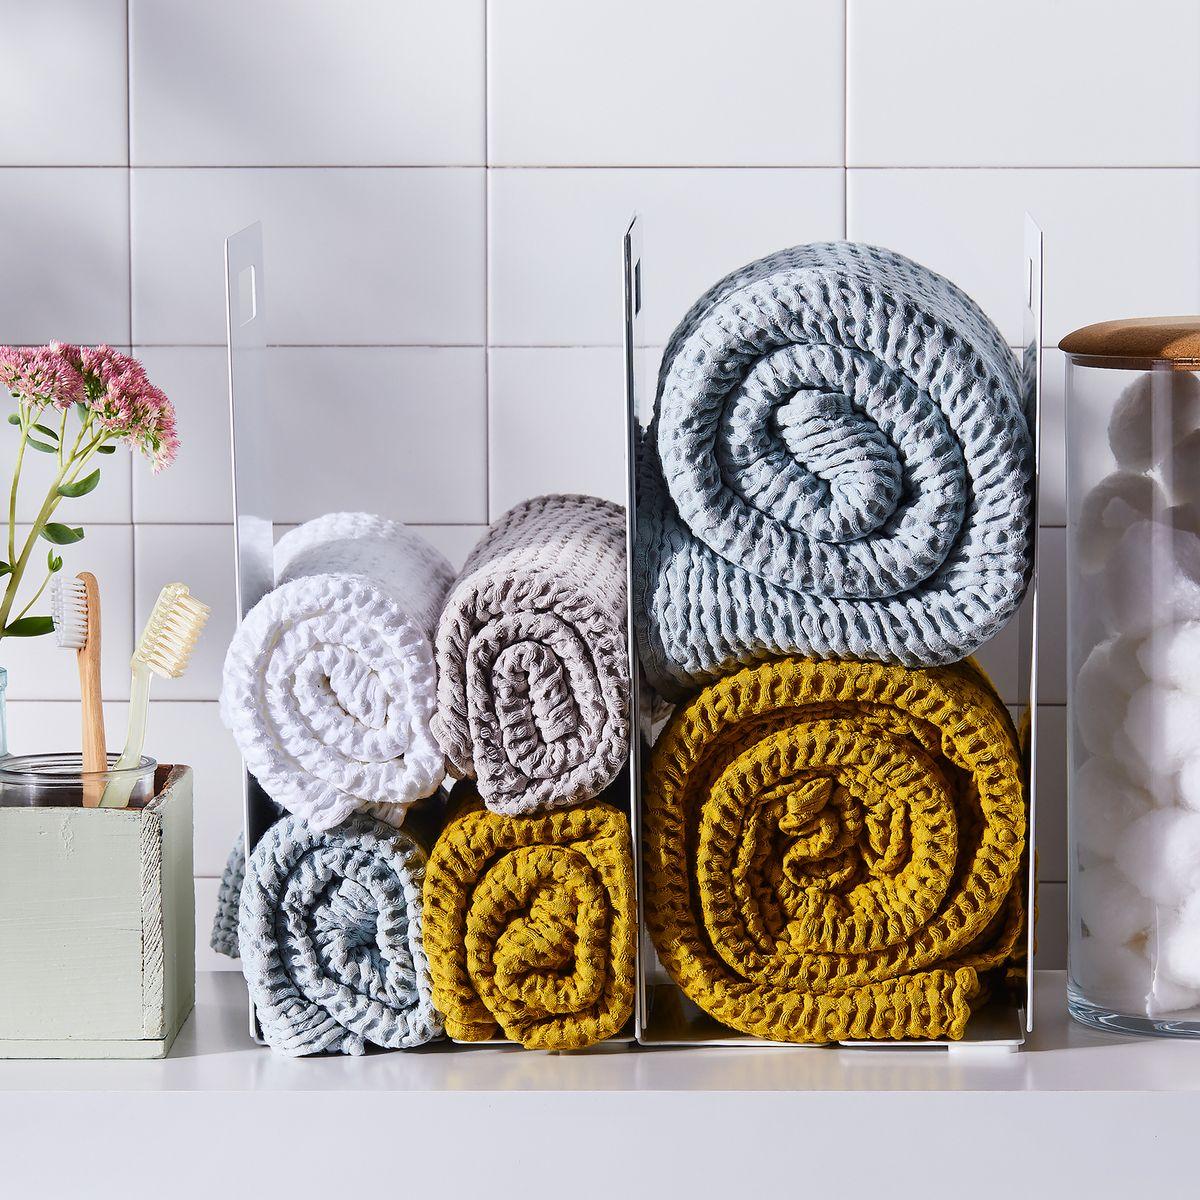 Towel Storage For Small Bathrooms 4 Towel Display Ideas